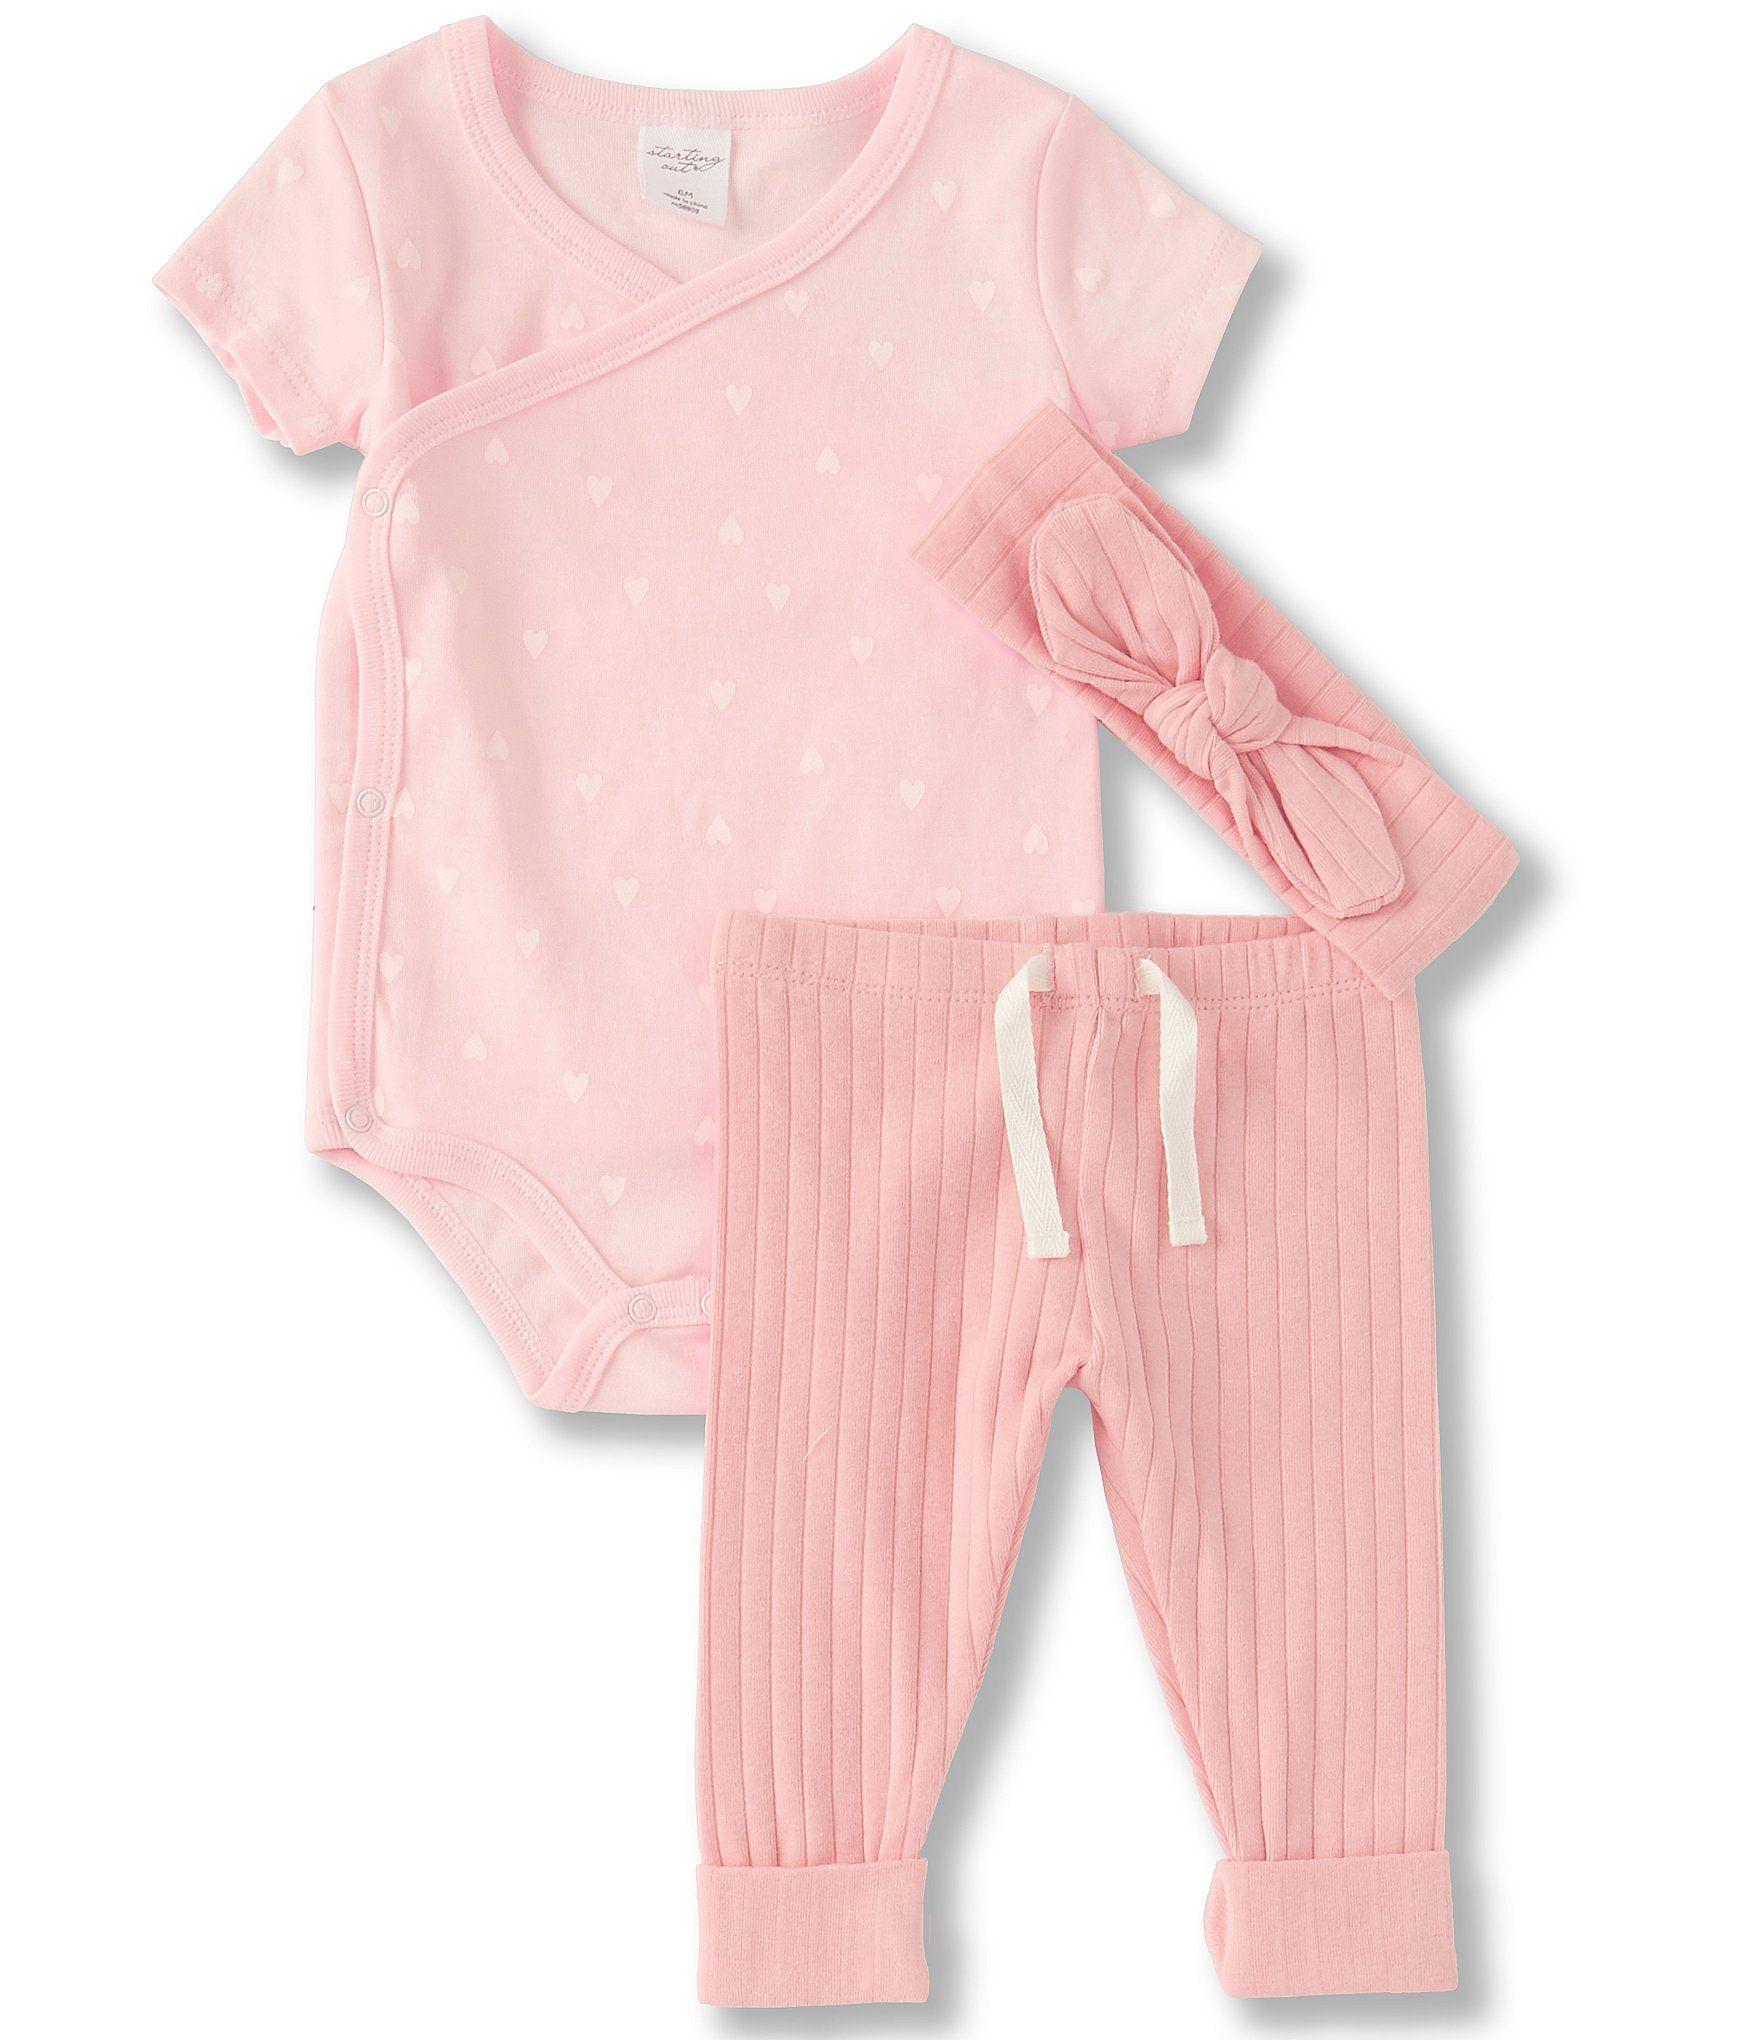 Starting Out Baby Girls Newborn-9 Months Short-Sleeve Heart Kimono Bodysuit, Leggings & Headband Set | Dillard's #babygirlheadbands